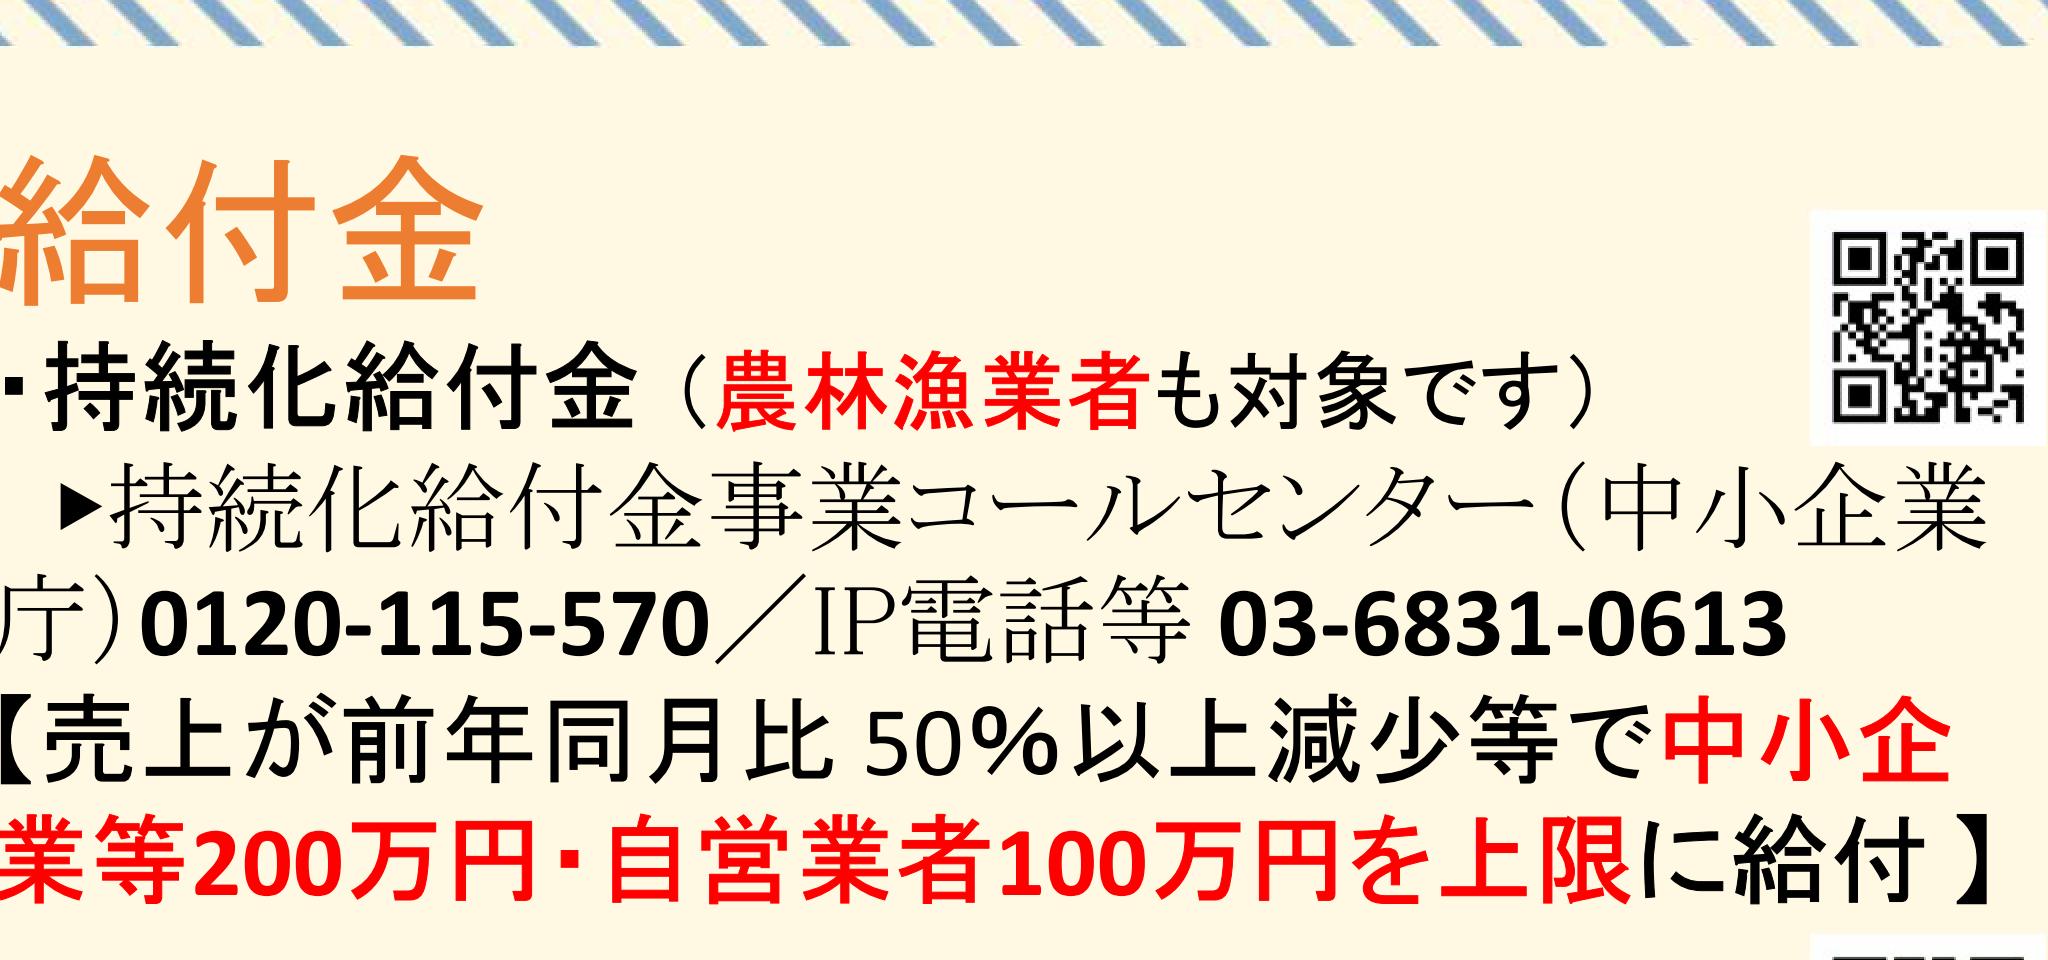 200530_02s